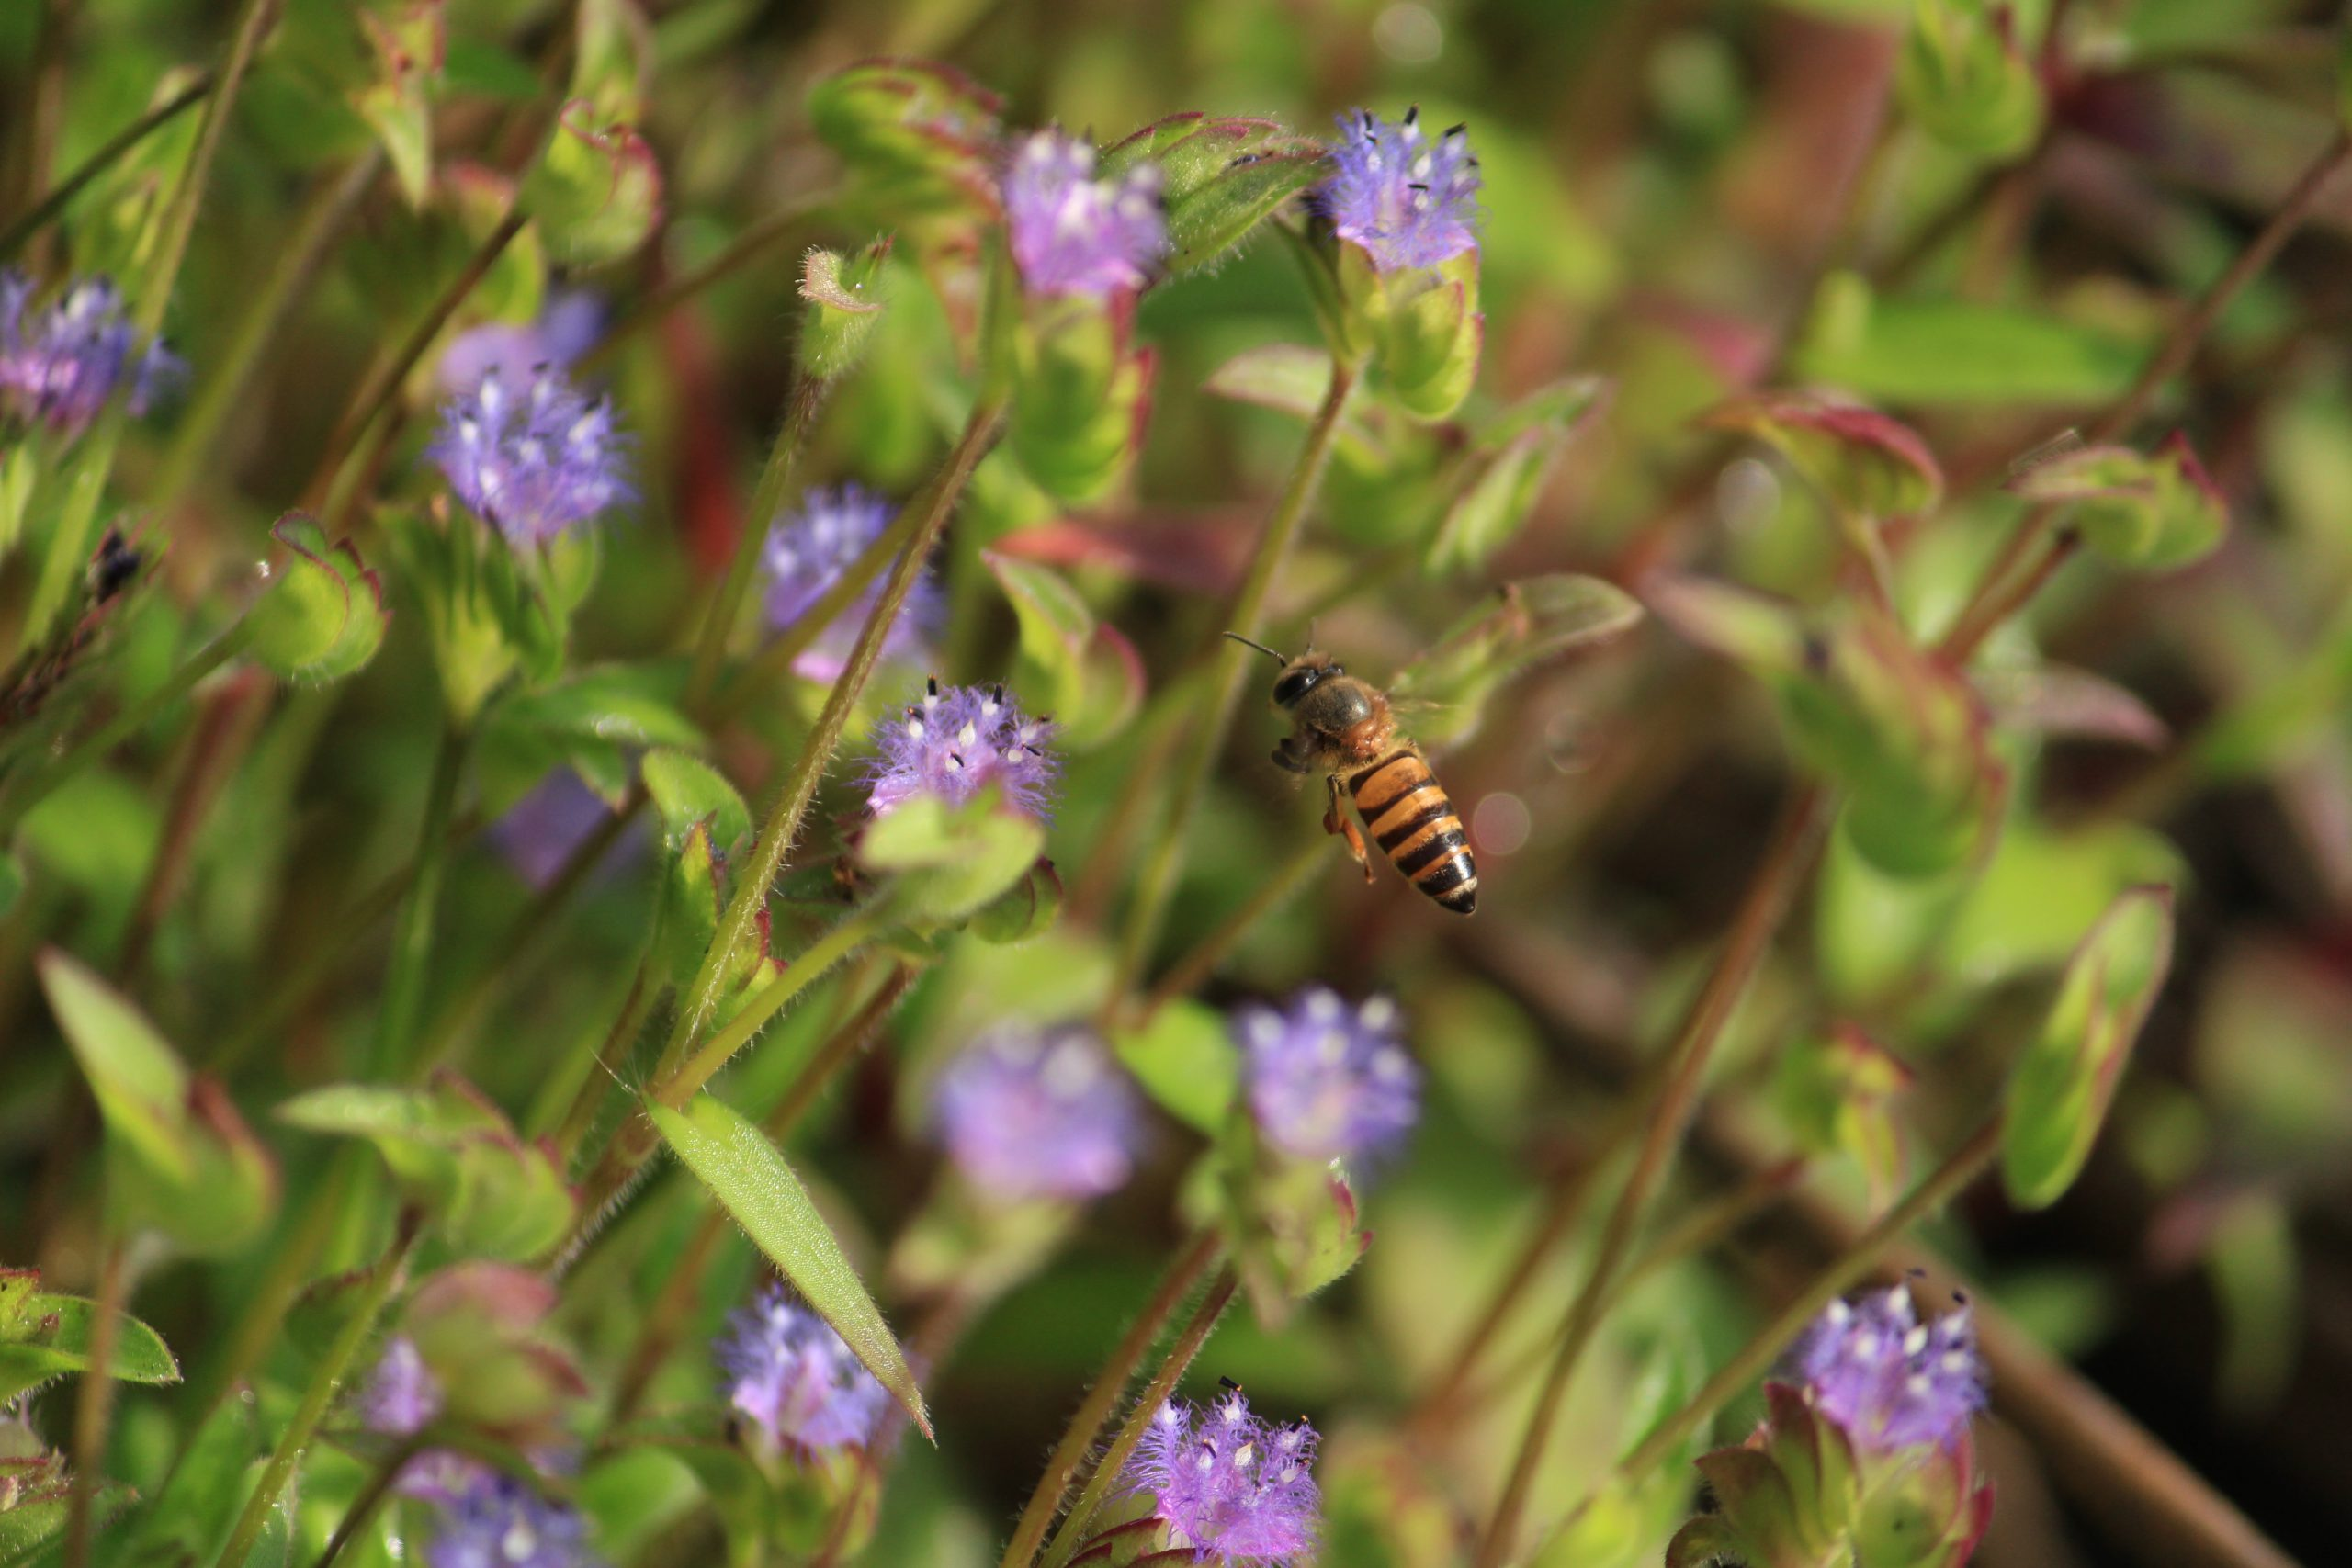 A honeybee hovering around flowers